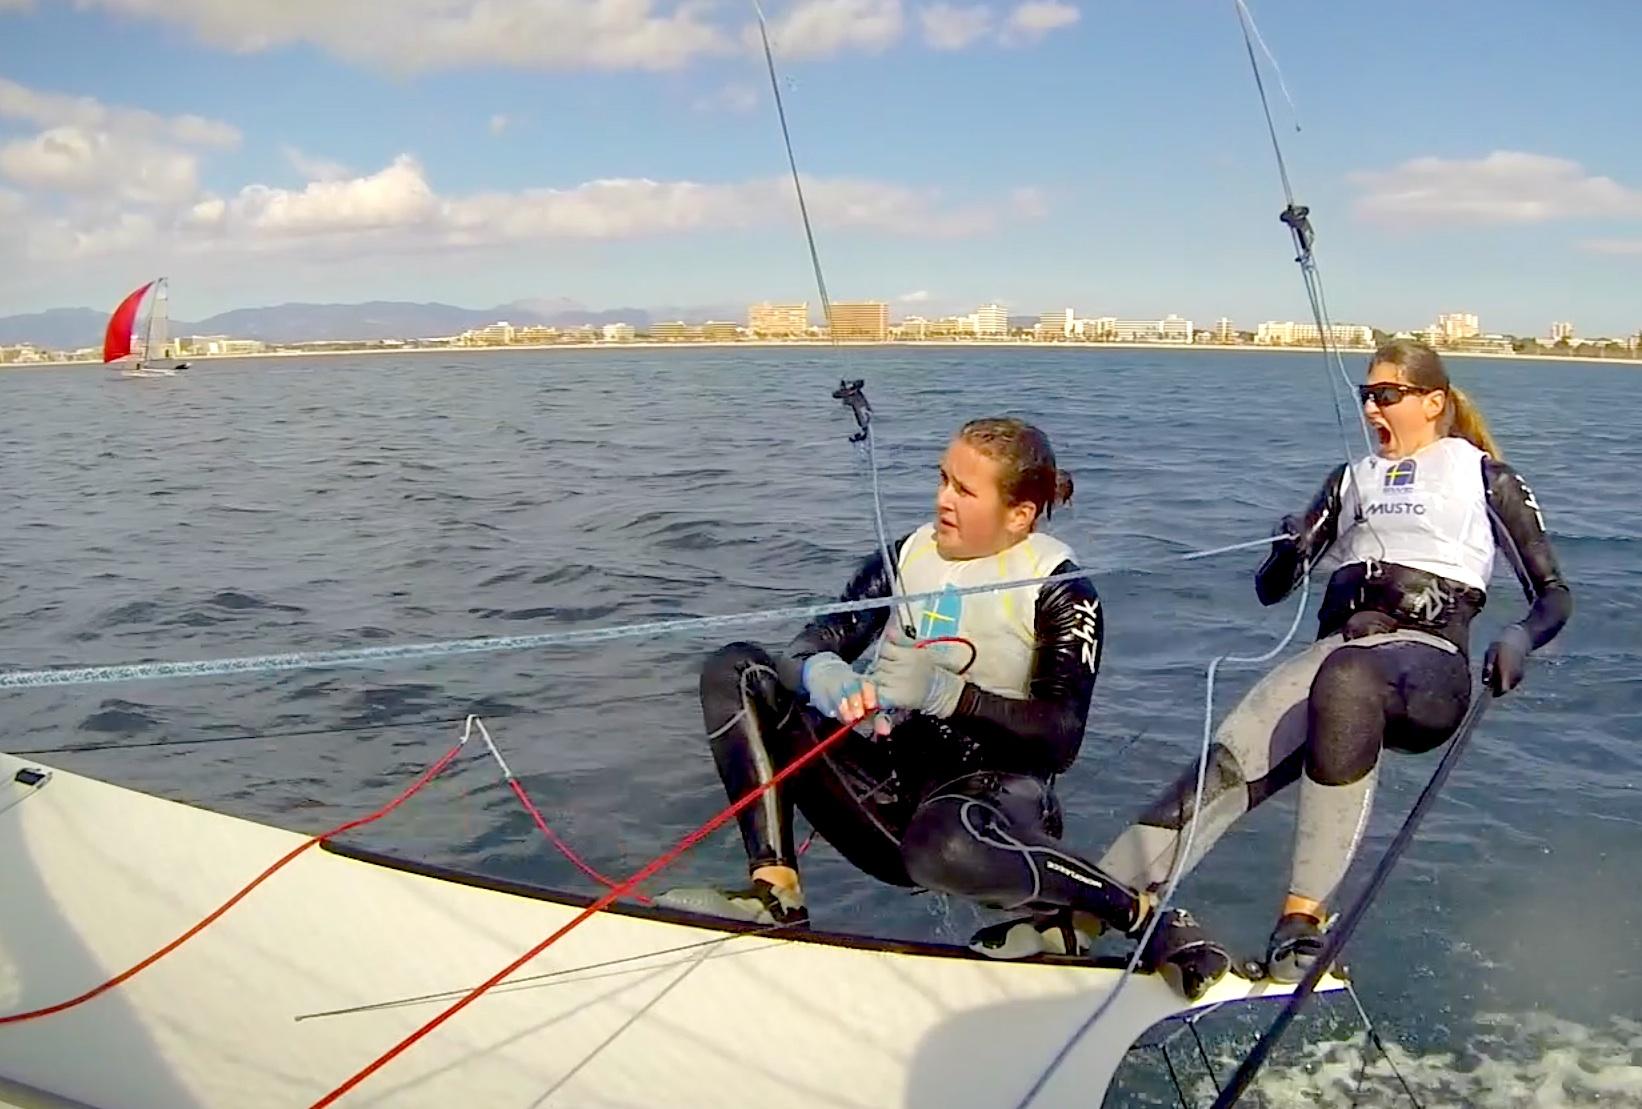 bloggare_Team49erFX_Mallorca_Julia_Cisso_Mallorca_1_FB